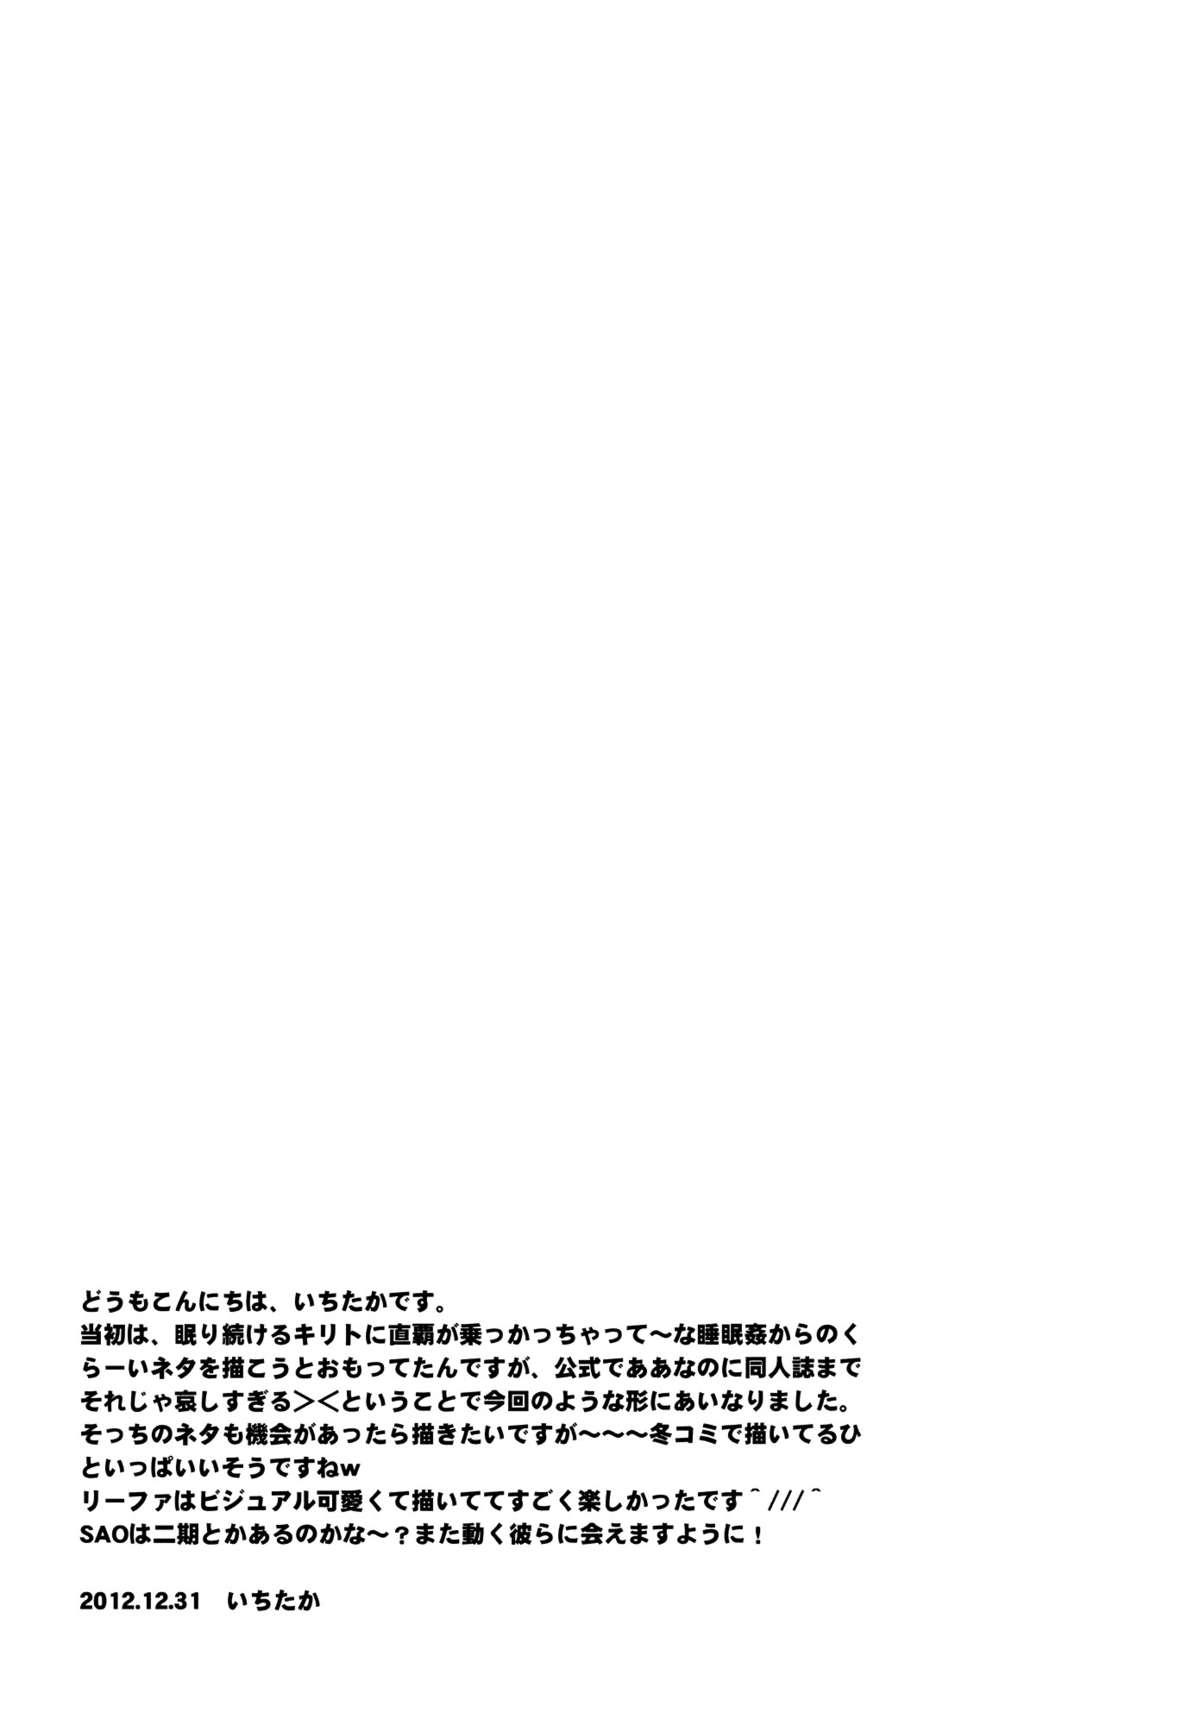 (C83) [Crazy9 (Ichitaka)] C9-03 Suguha to Lyfa to Oniichan no Shiawase Kazoku Keikaku   Plan For a Happy Family-Life with Suguha, Leafa, and Onii-chan (Sword Art Online) [English] {doujin-moe.us} 26